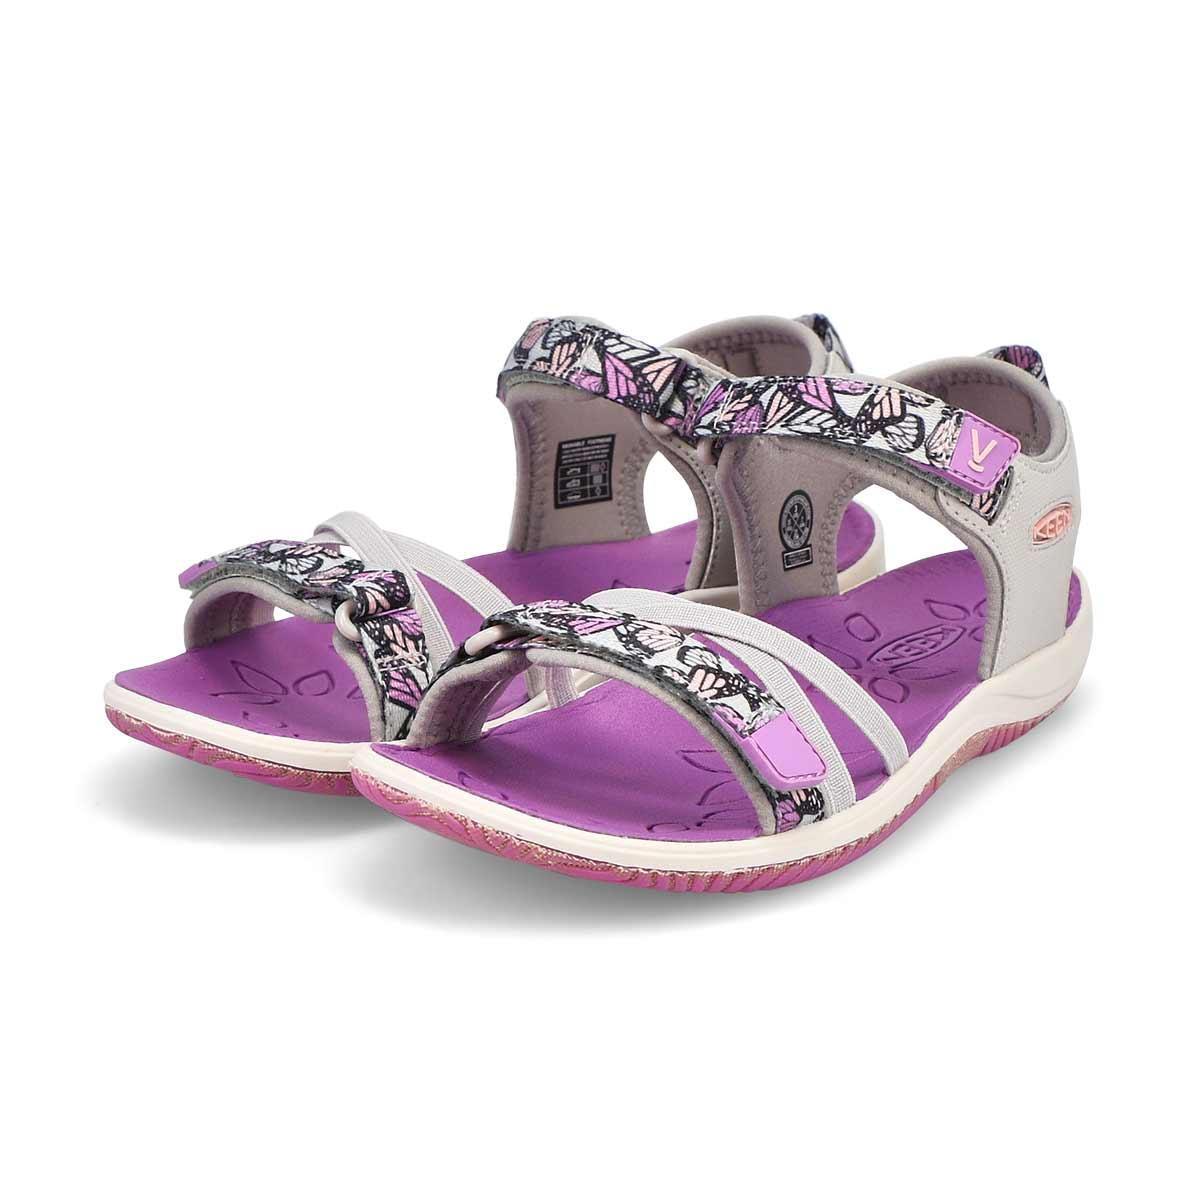 Girls' Verano Sport Sandal - Vapor/Violet